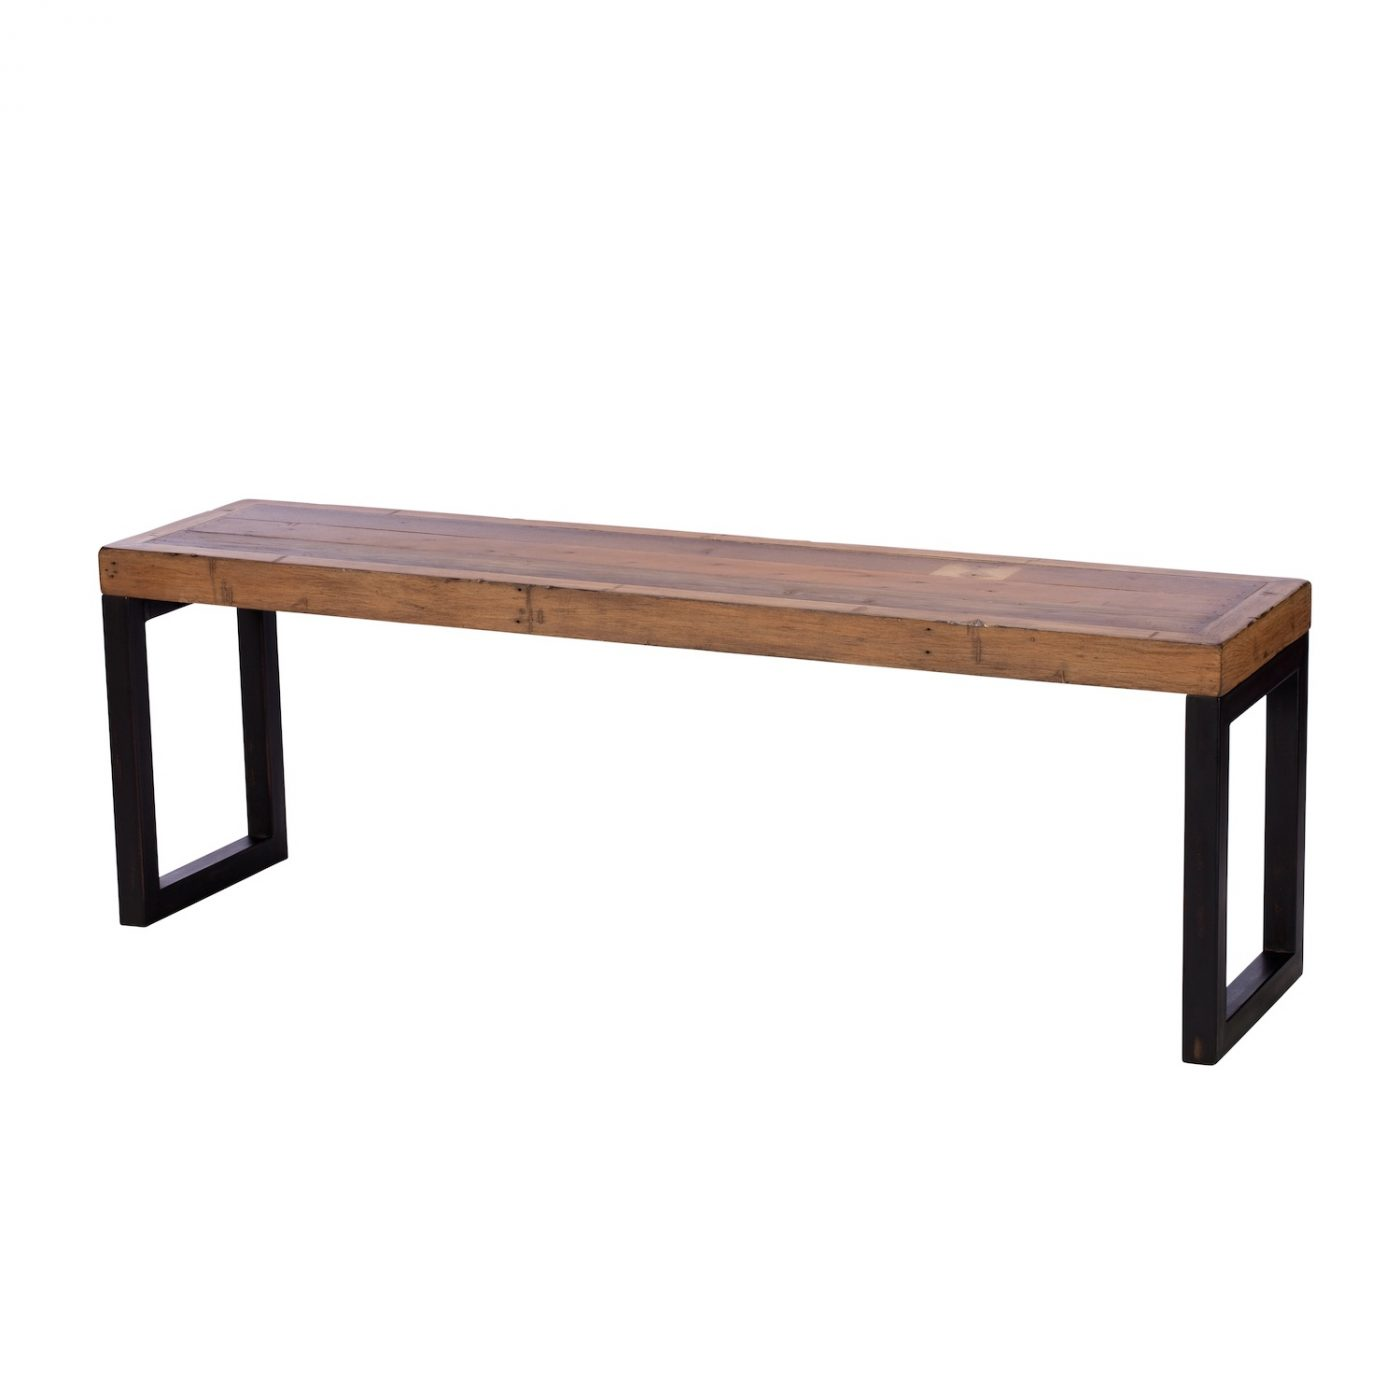 Newland 140cm Bench